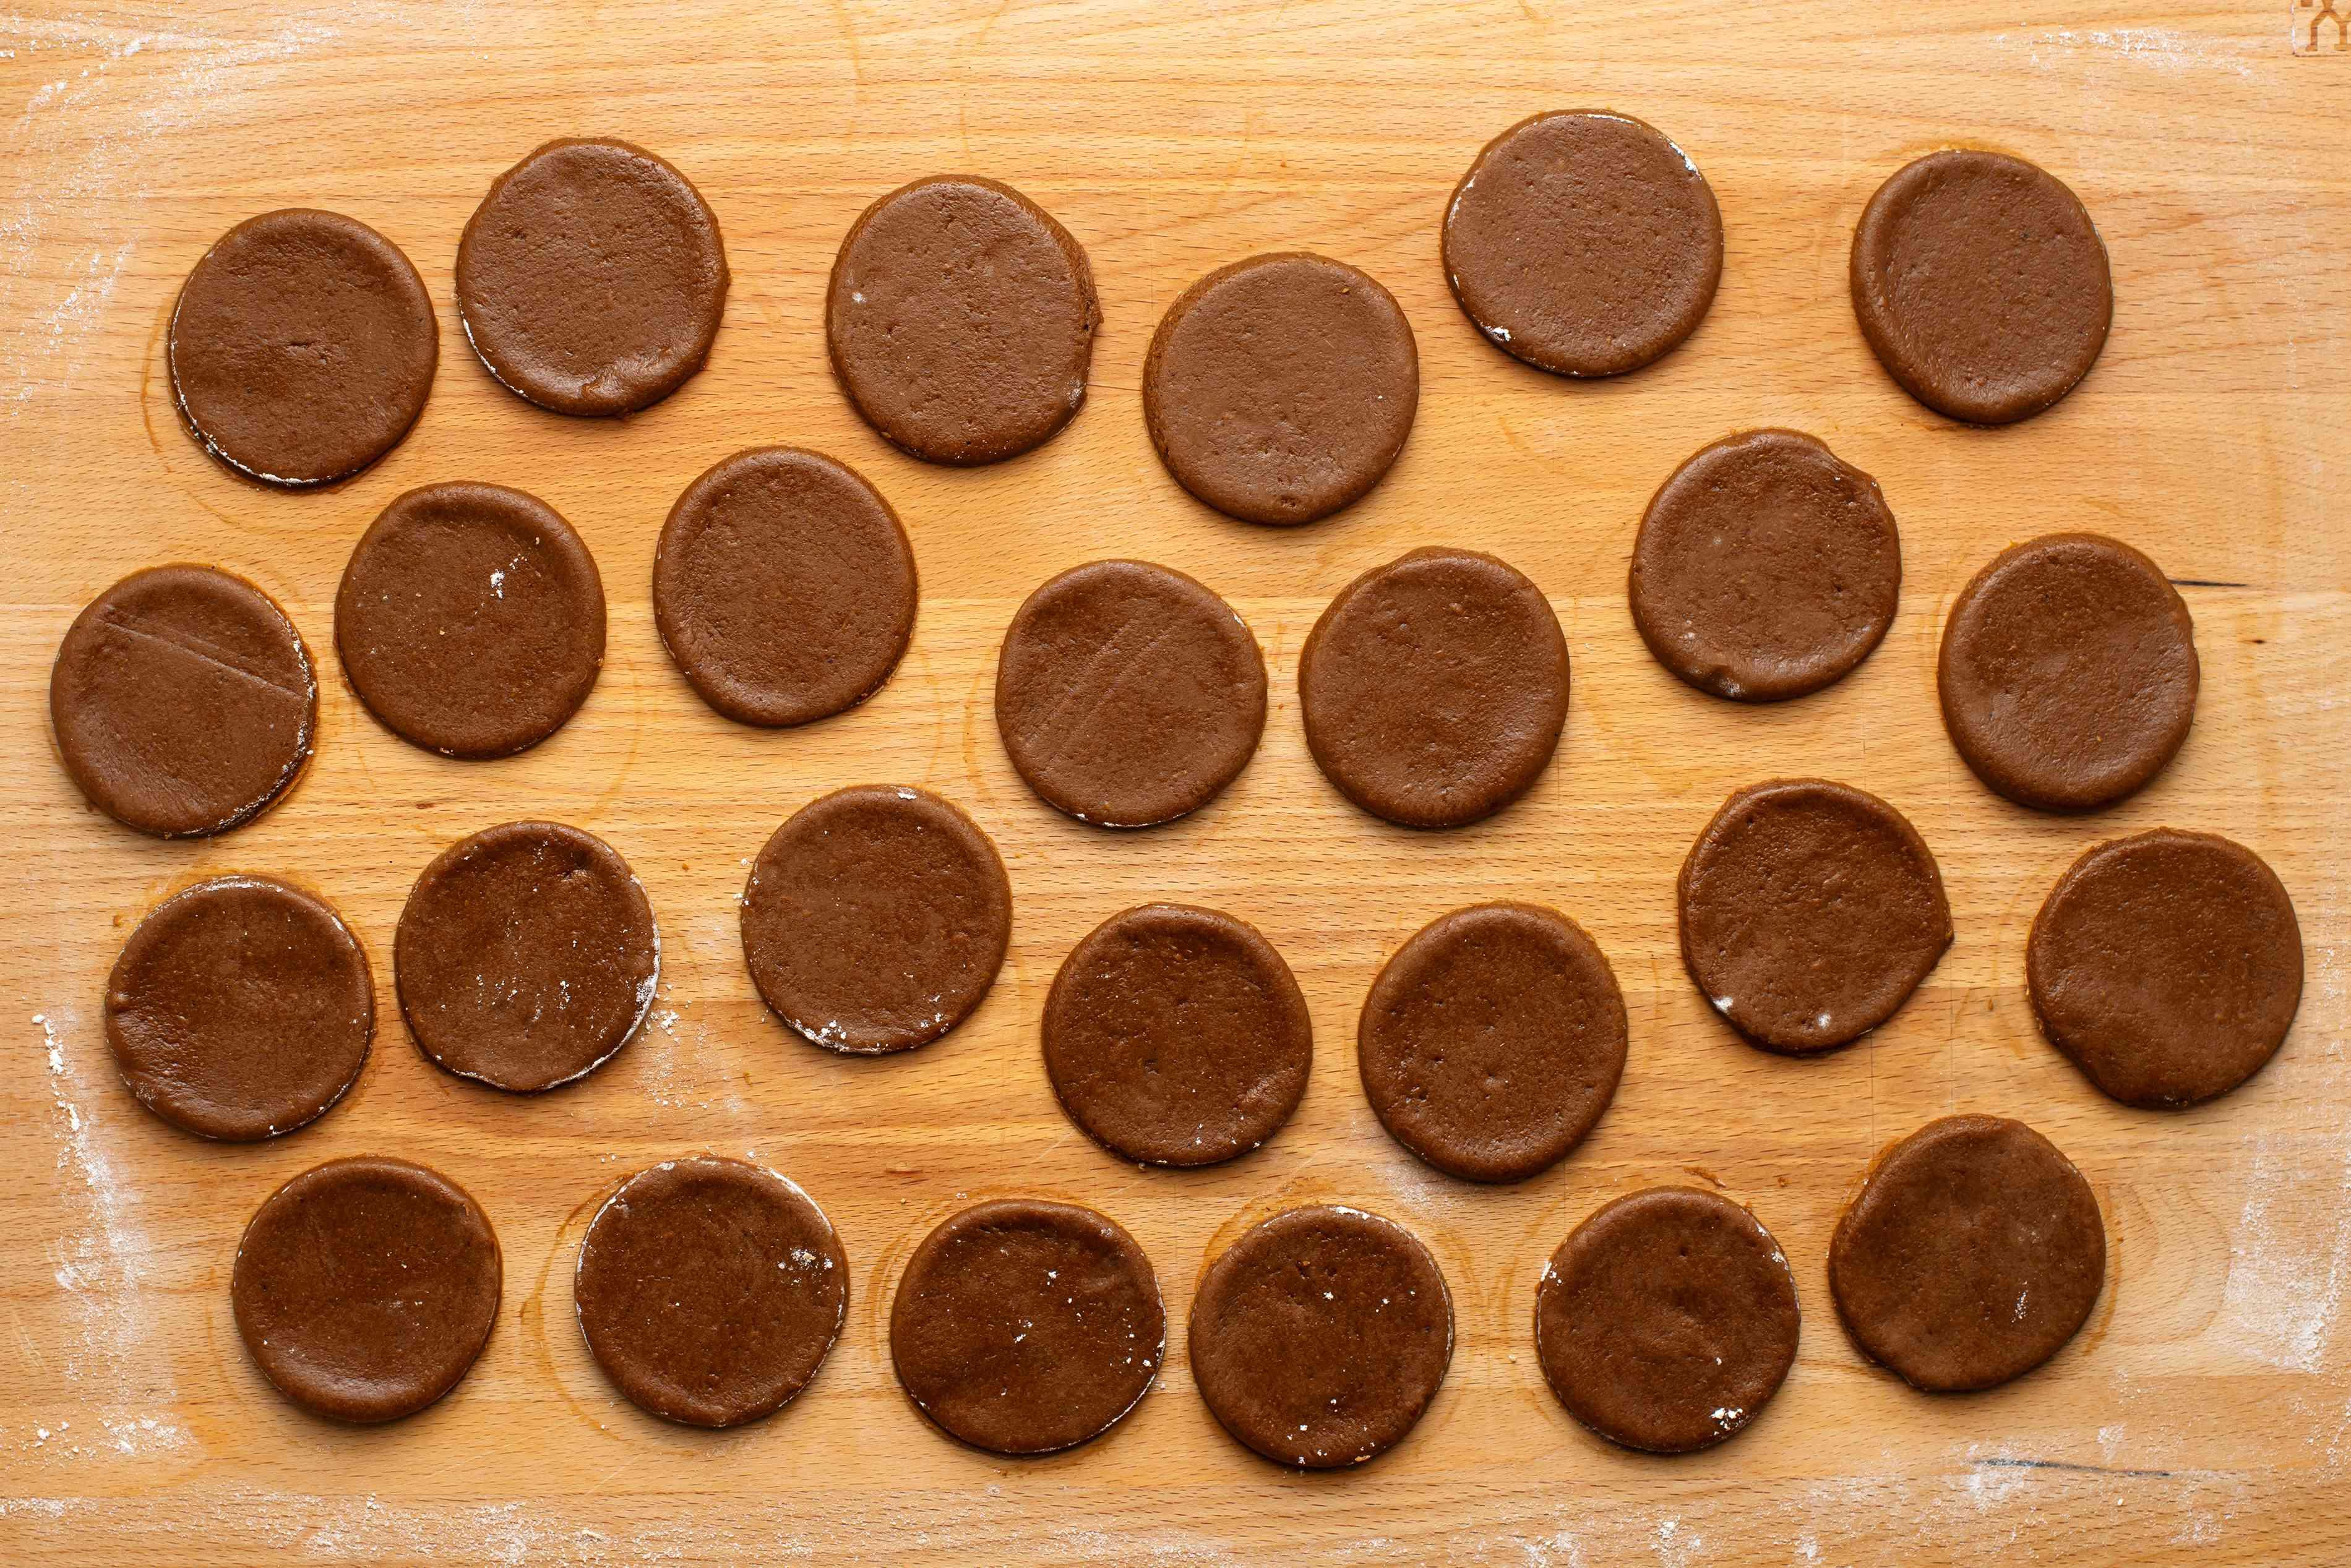 molasses cookie dough pieces on a floured surface